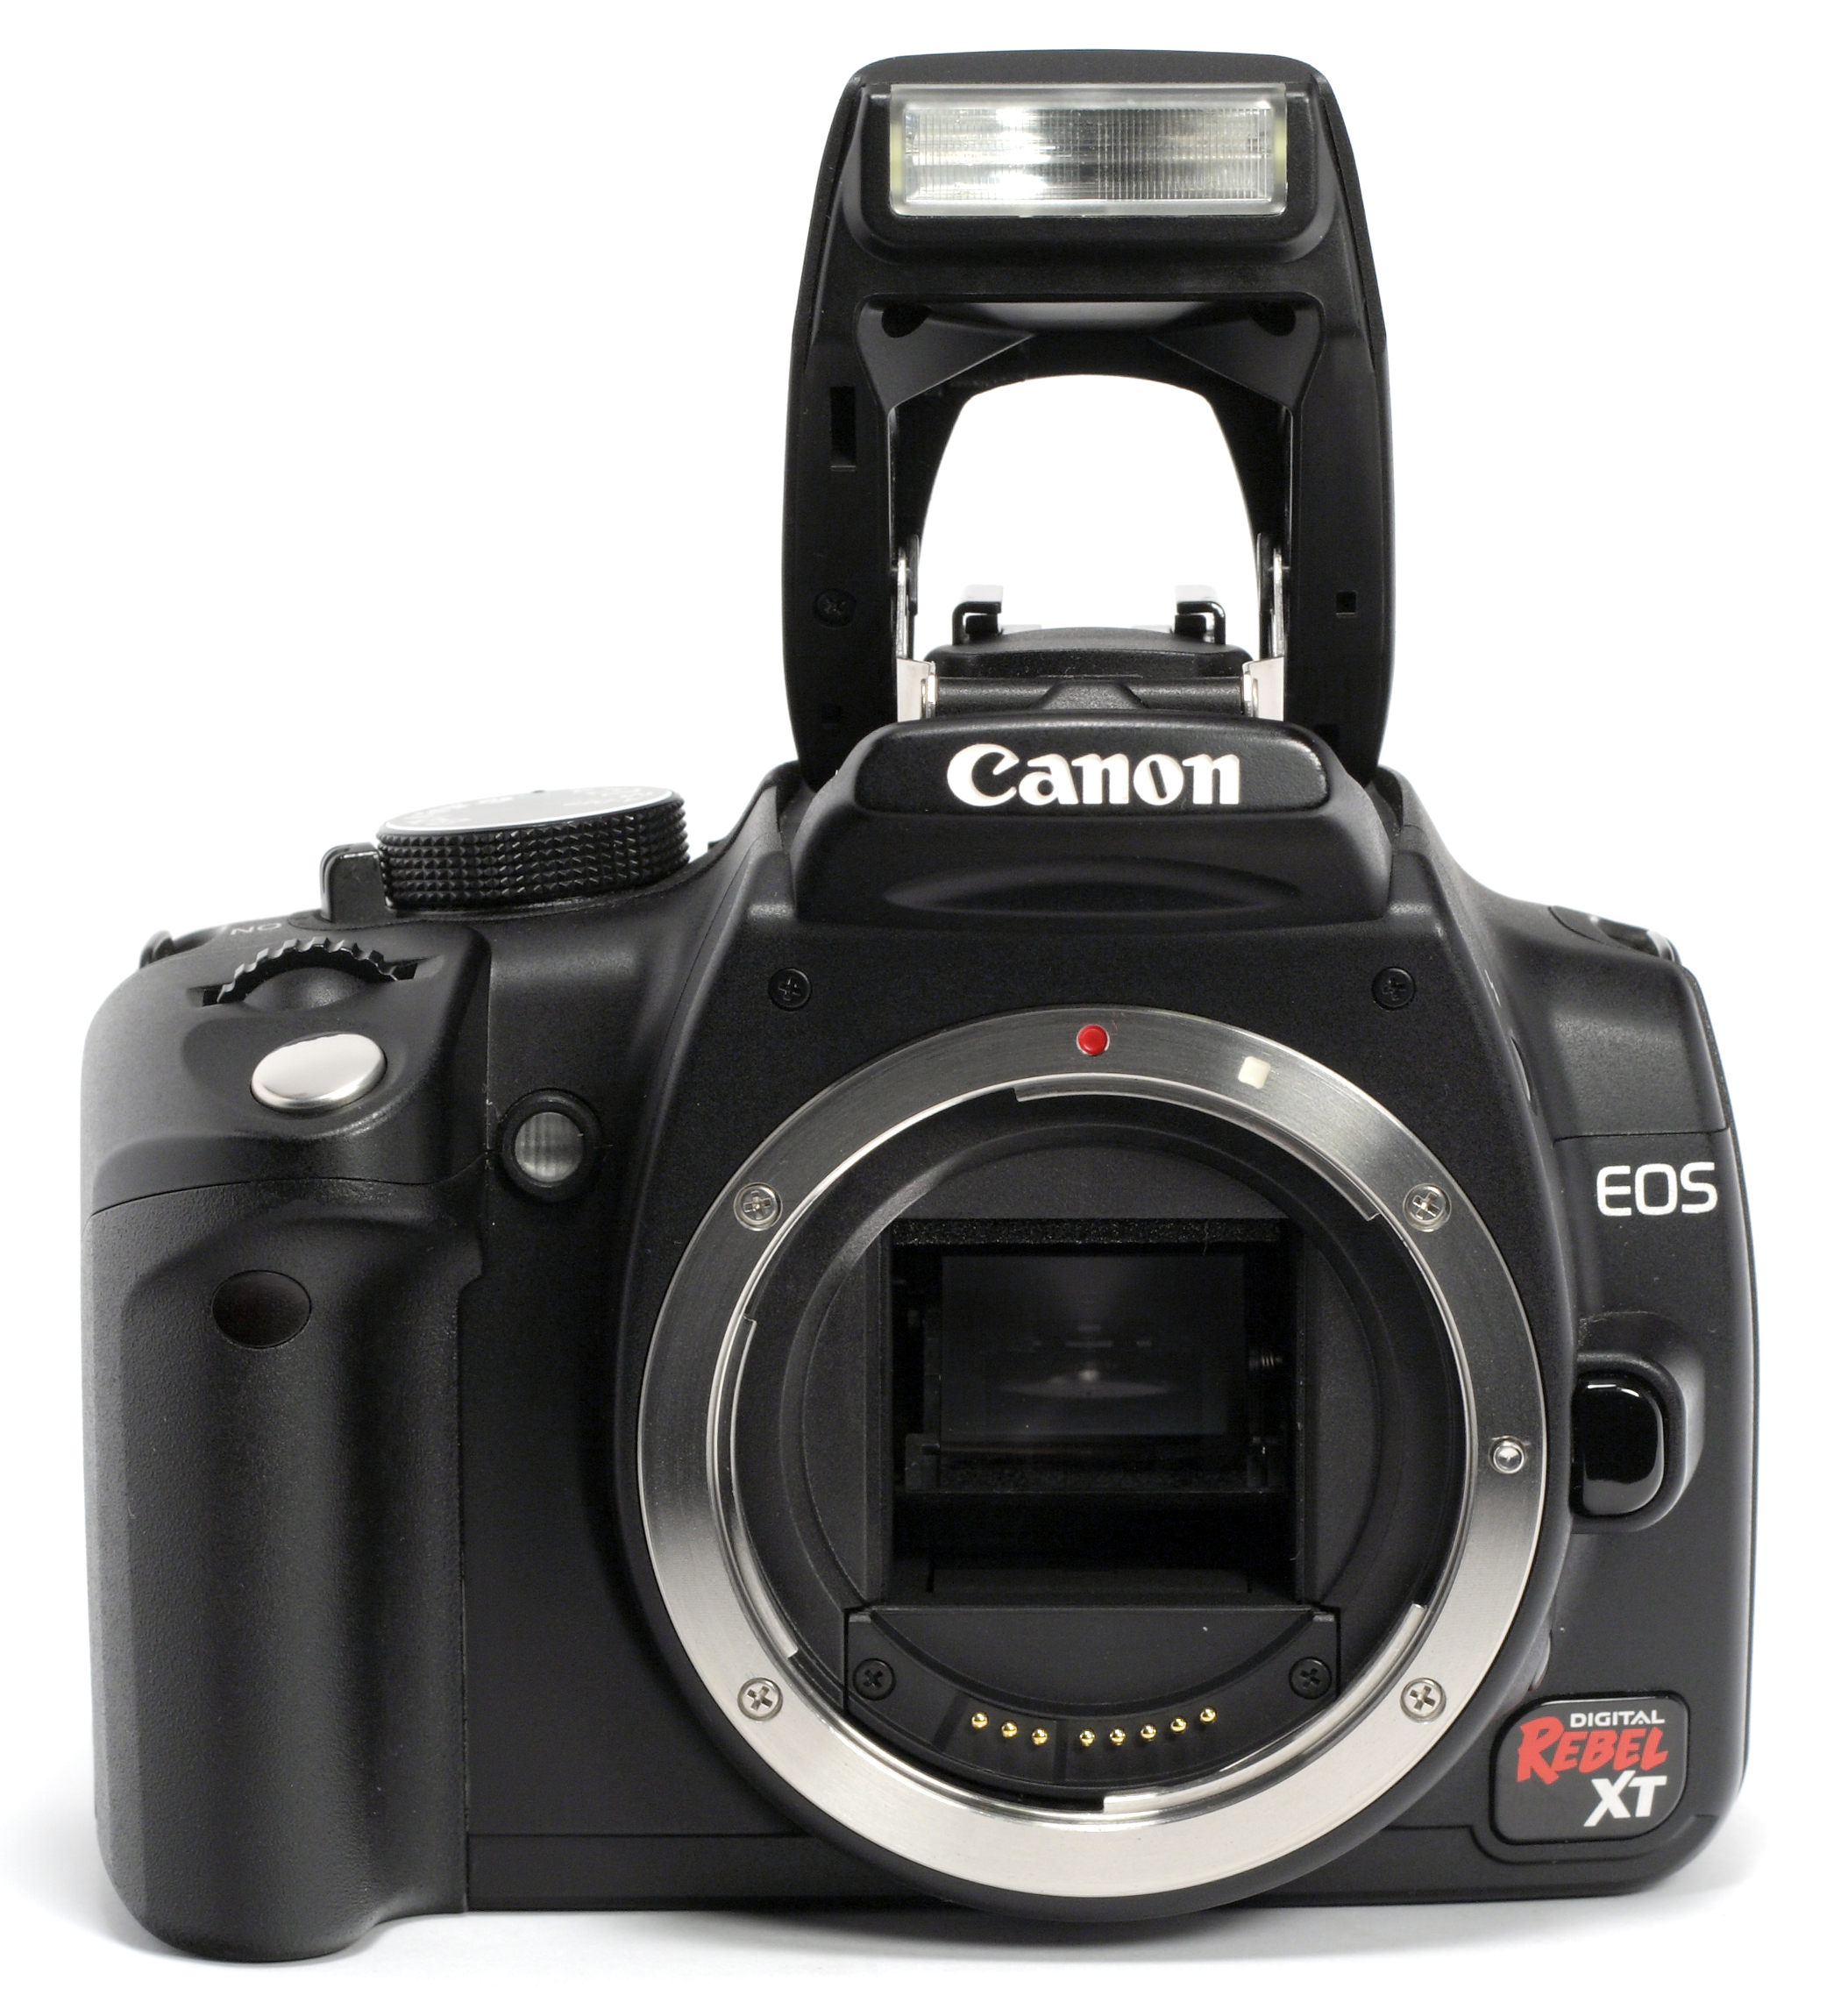 Canon EOS 350D camera image